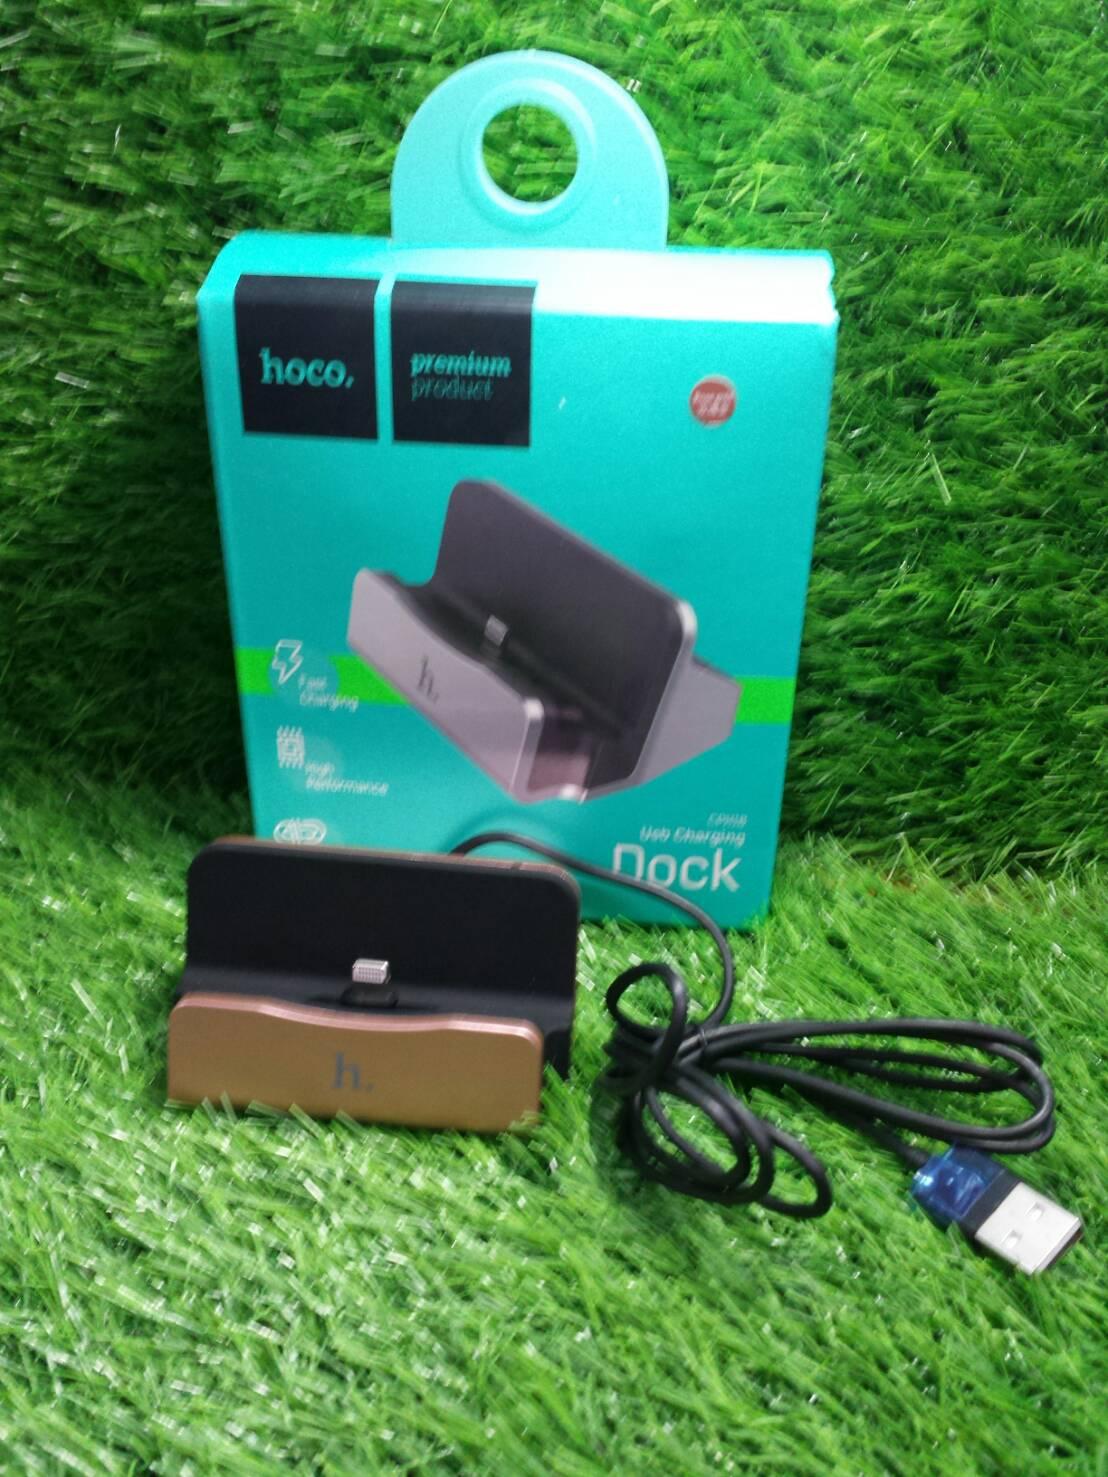 HOCO USB Charging Dock แท่นชาร์จไอโฟนสุดสวย